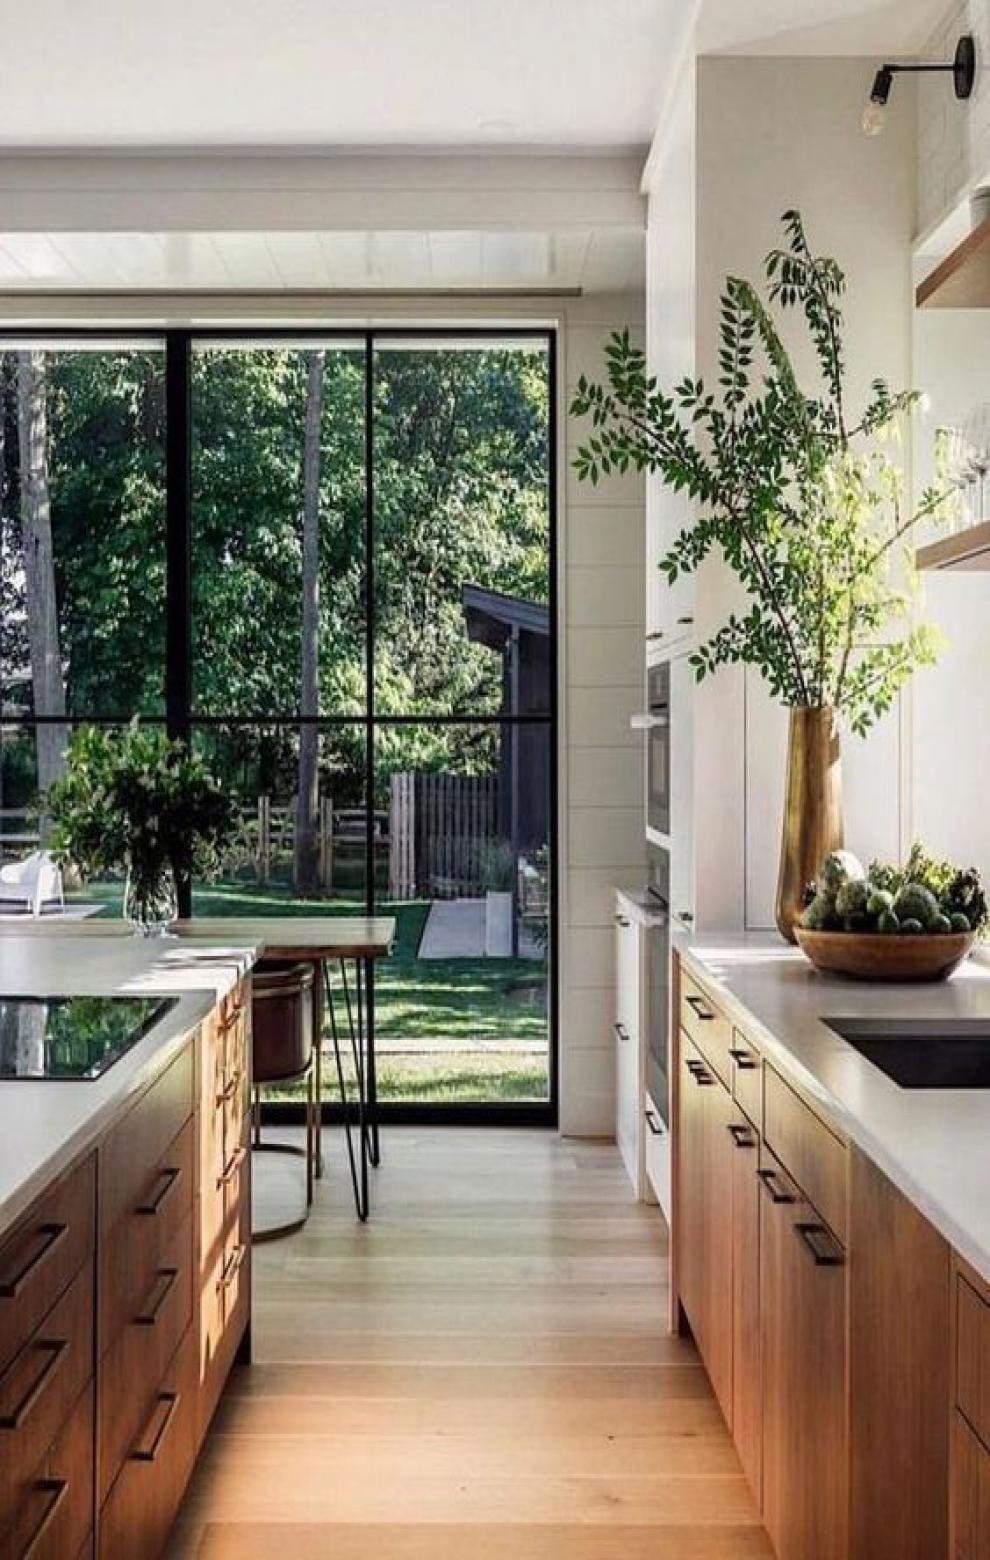 Photo of # kitchen decor at walmart # kitchen decor accessories # kitchen decor themes coffee …